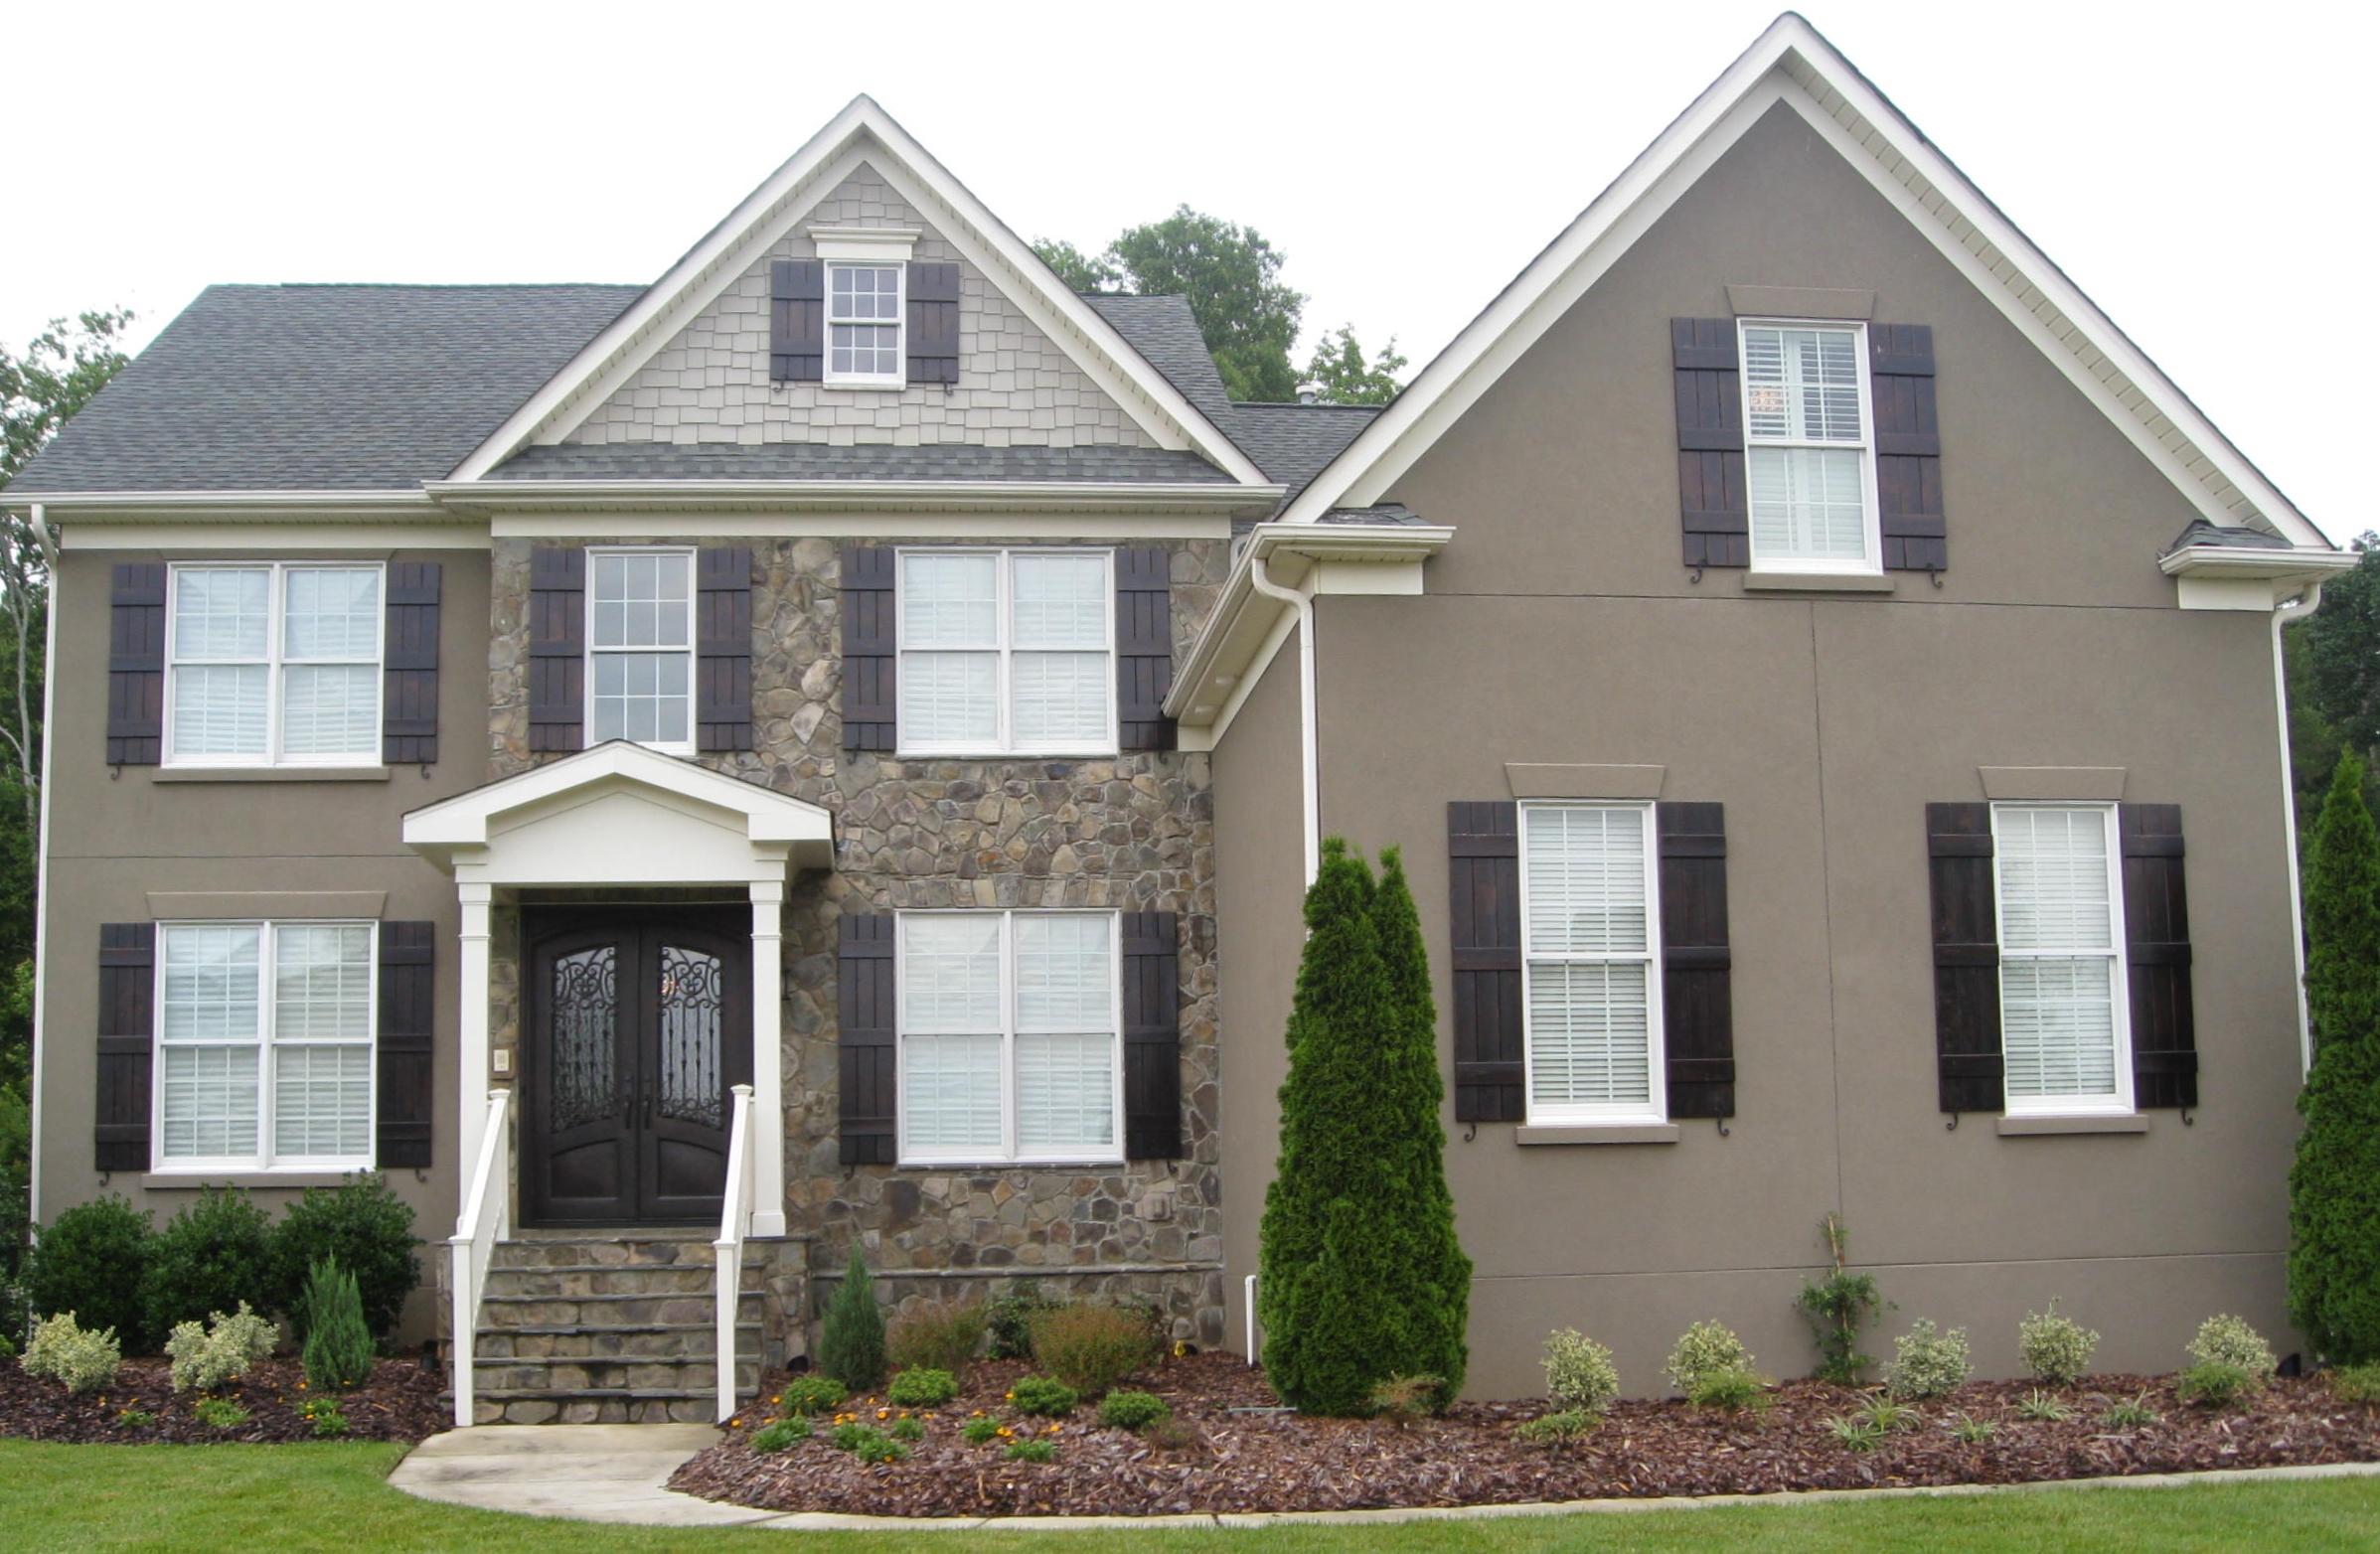 home exterior renovation specialists for edmonton st albert. Black Bedroom Furniture Sets. Home Design Ideas